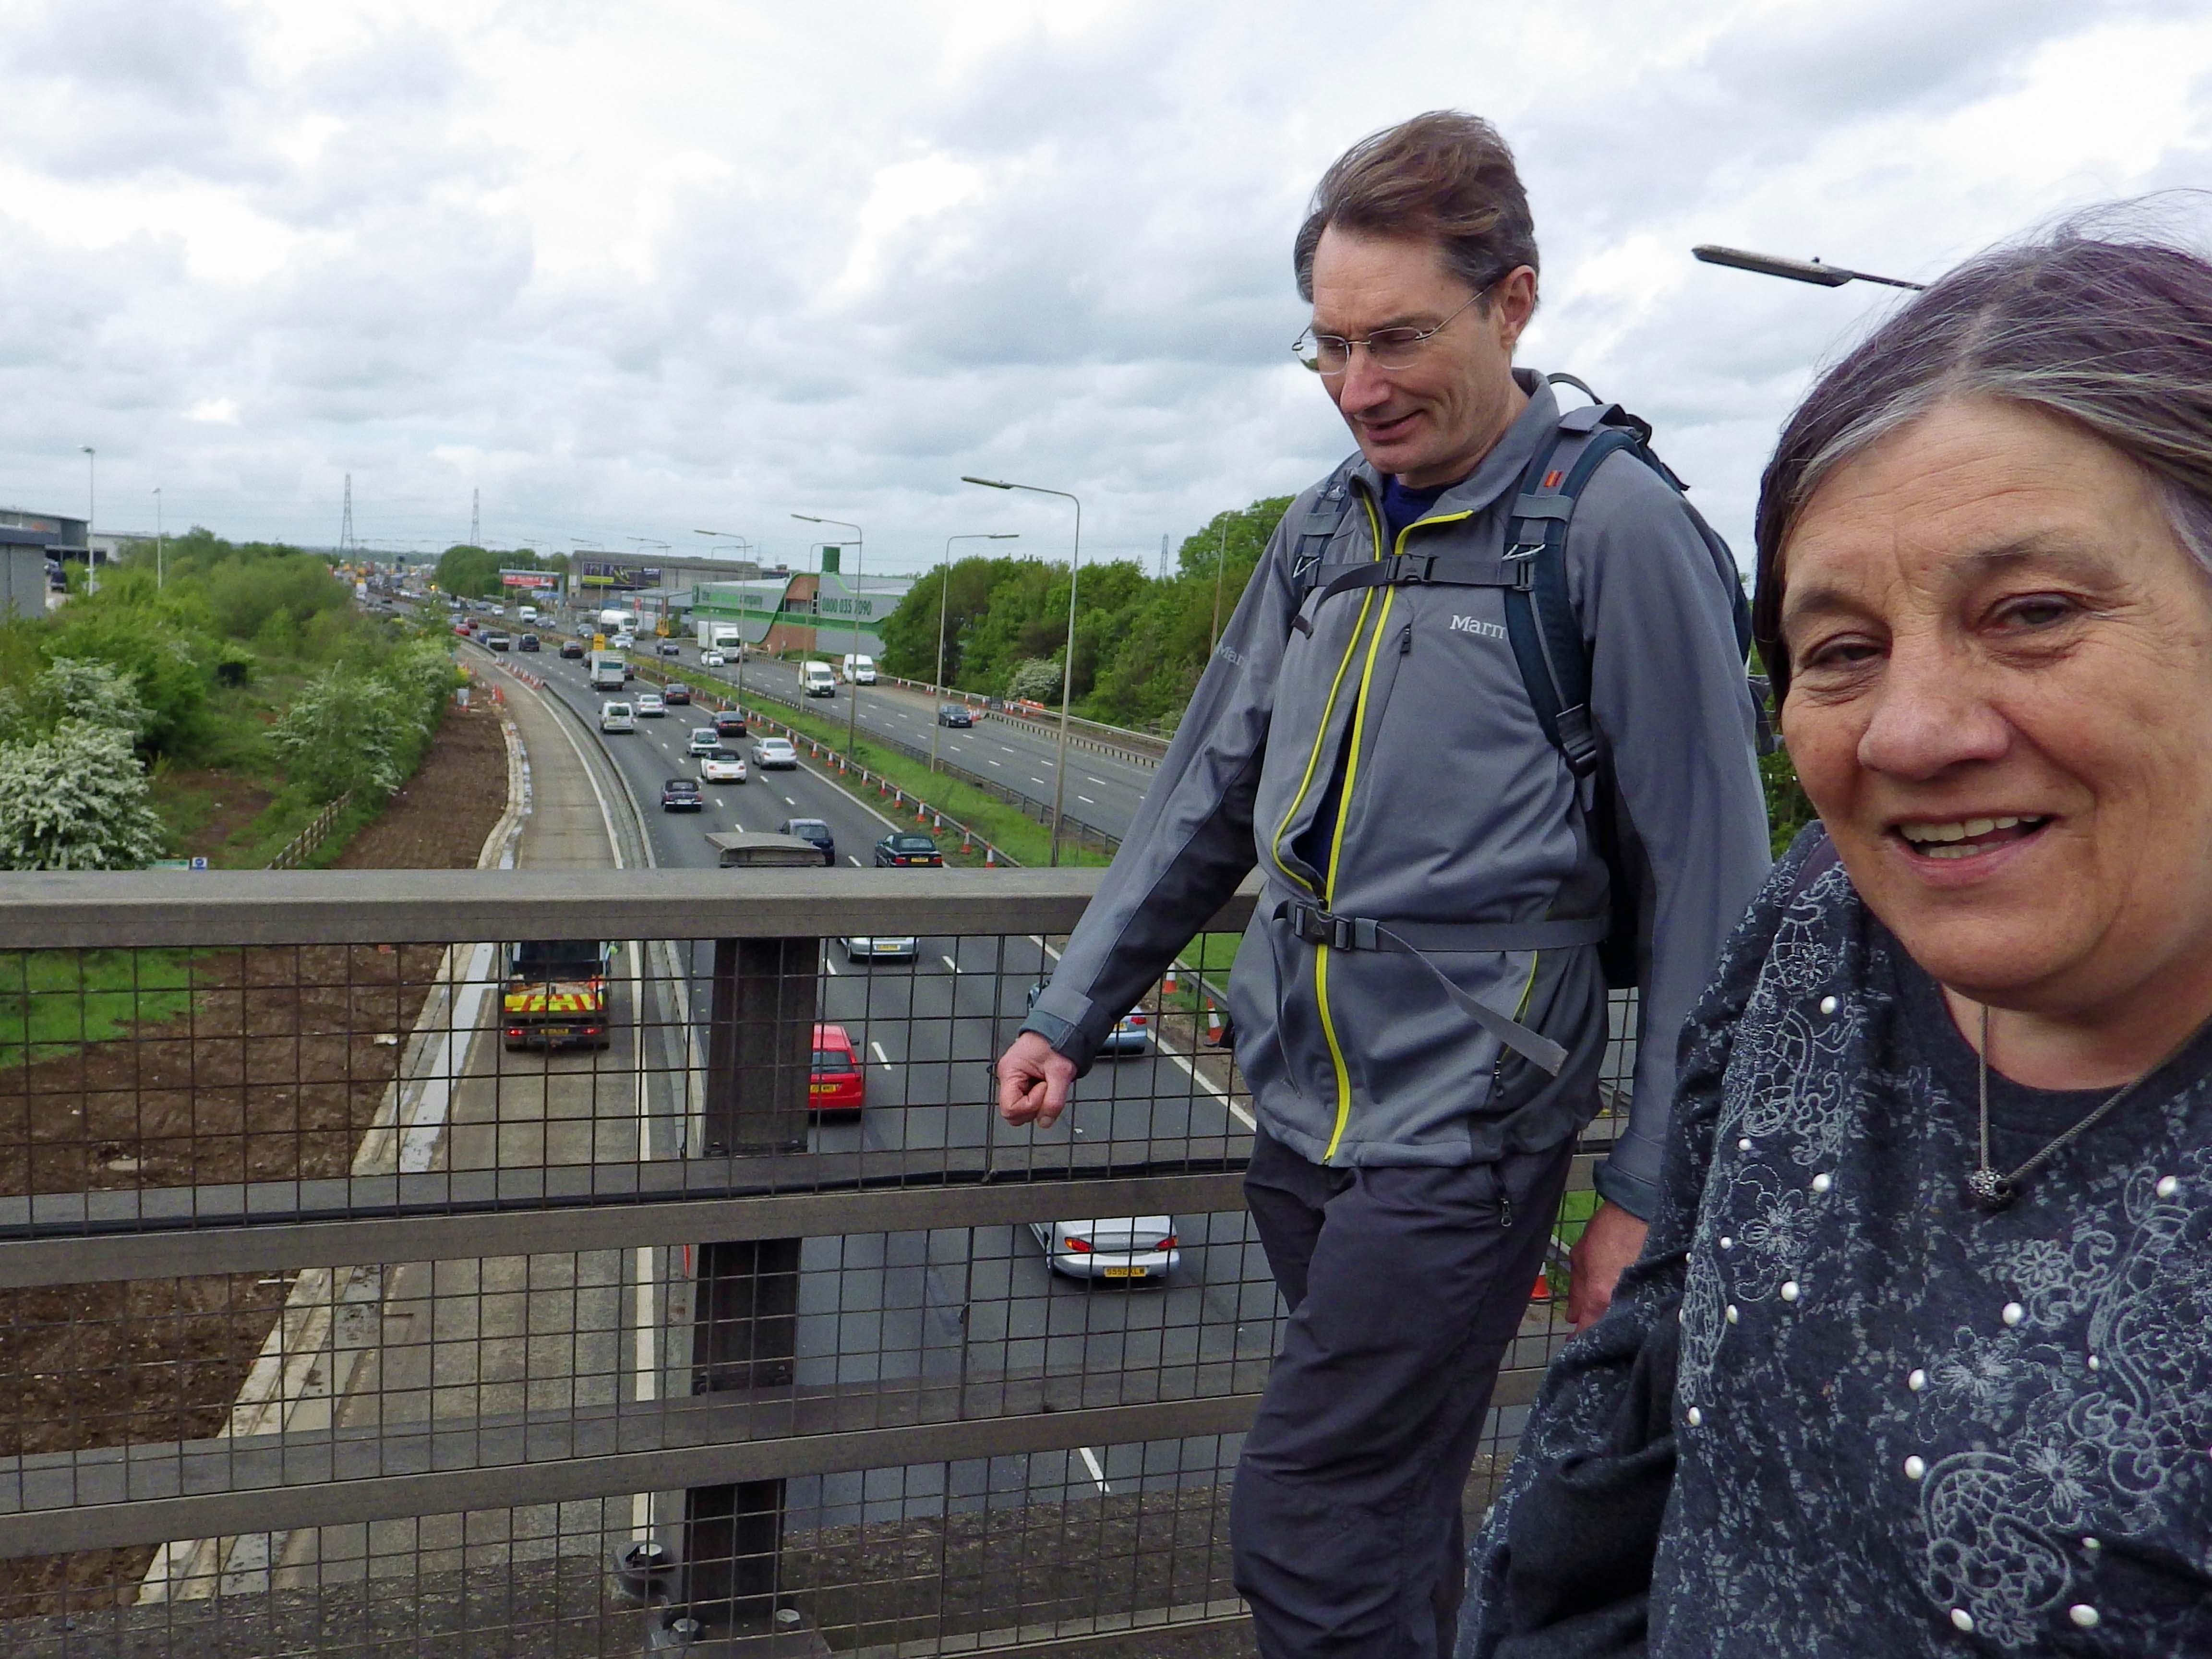 Crossing M25